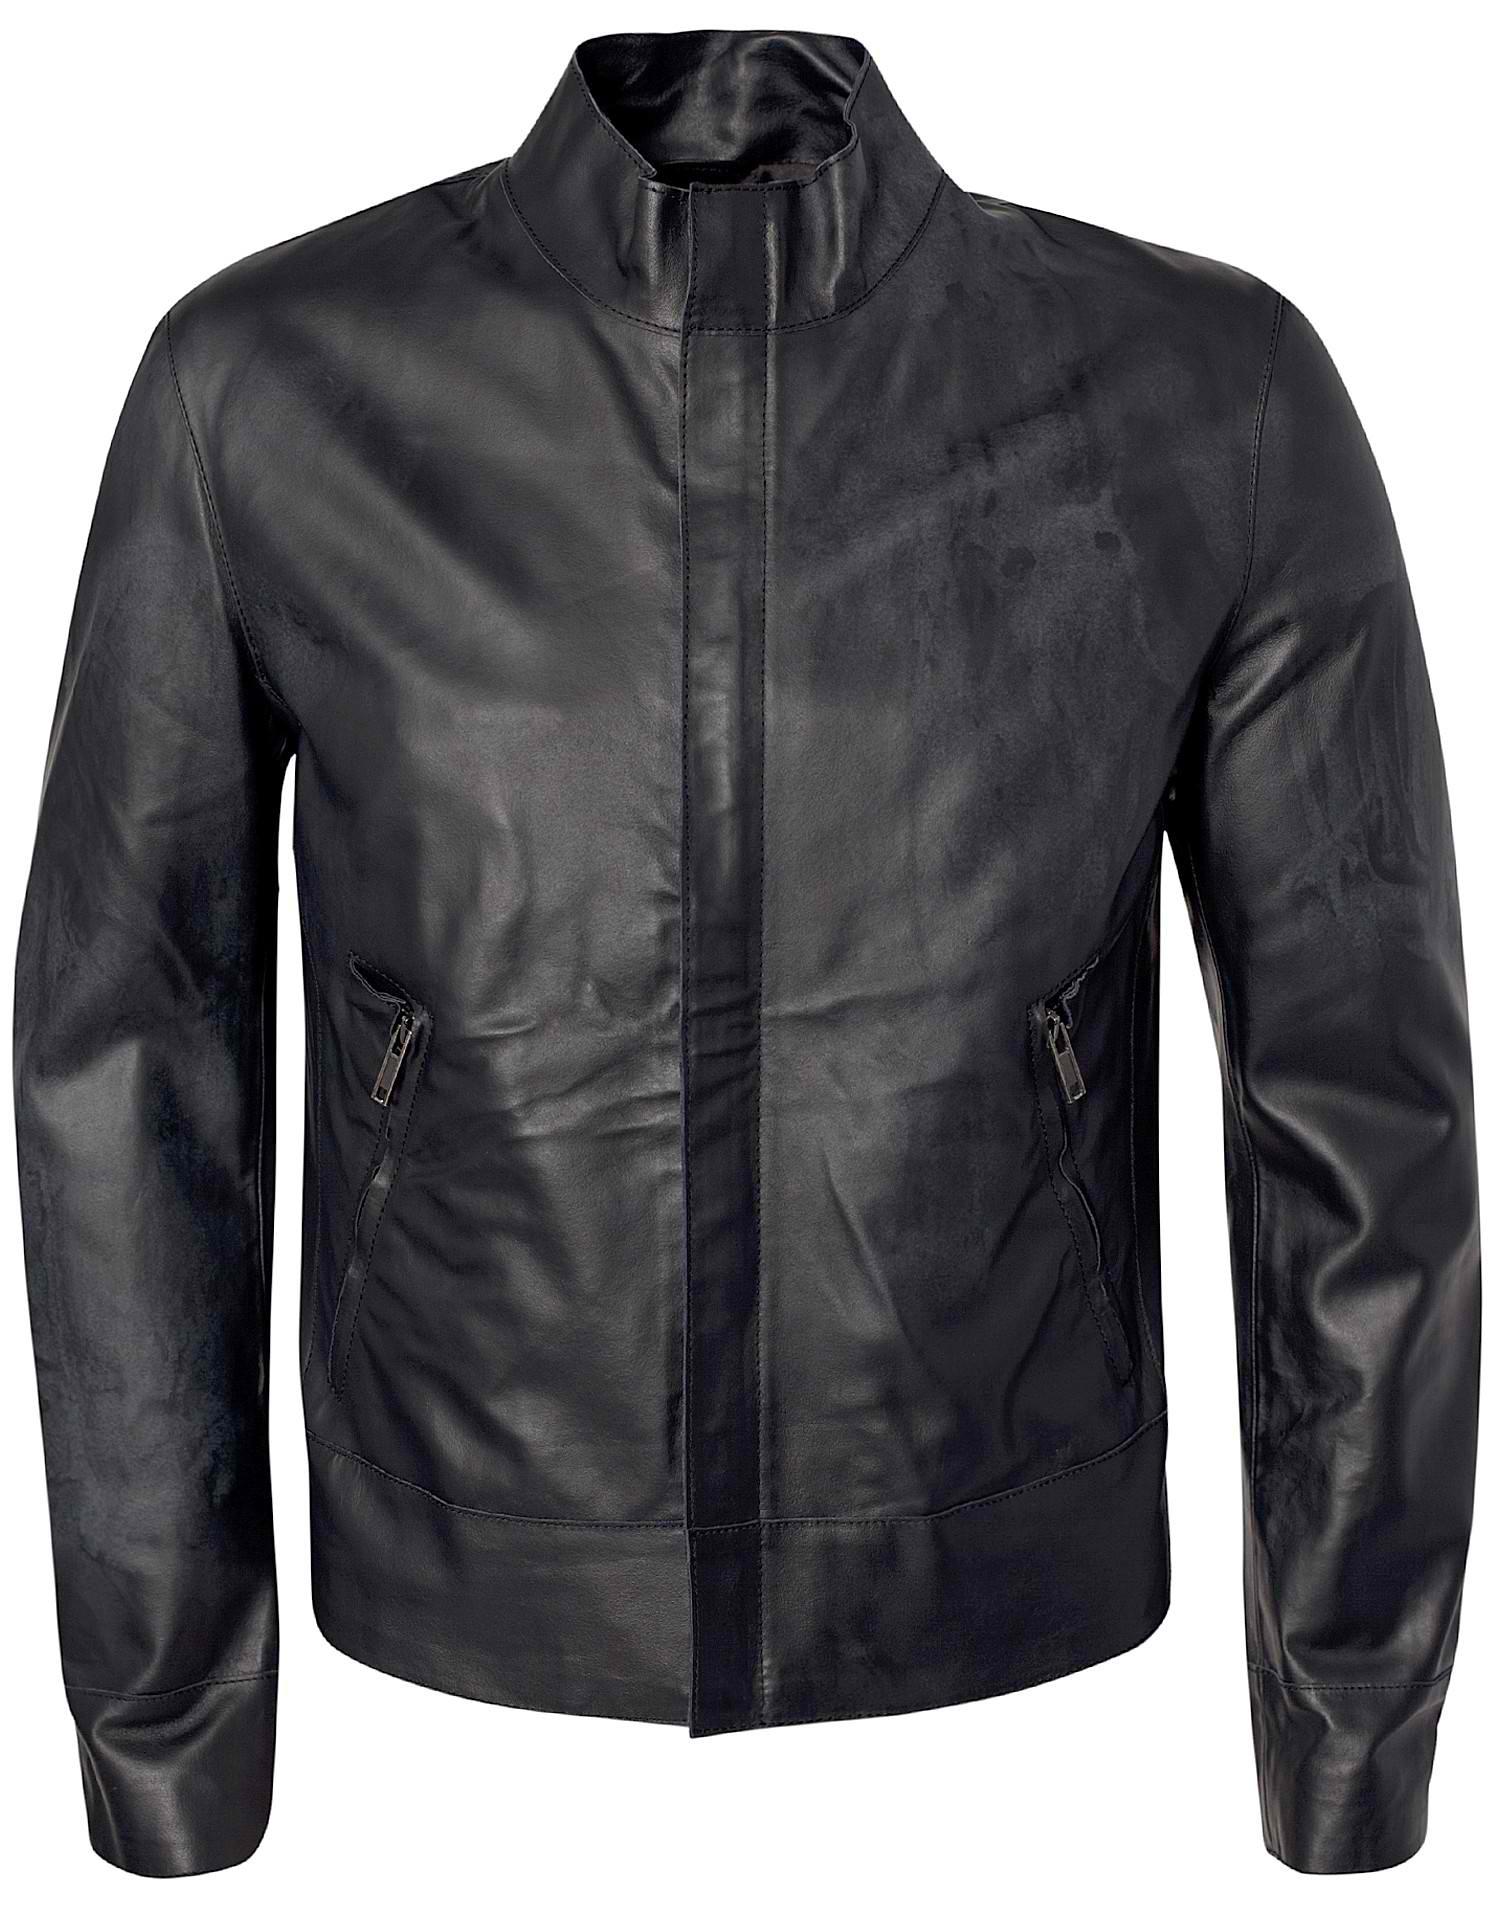 Ship a Leather Jacket